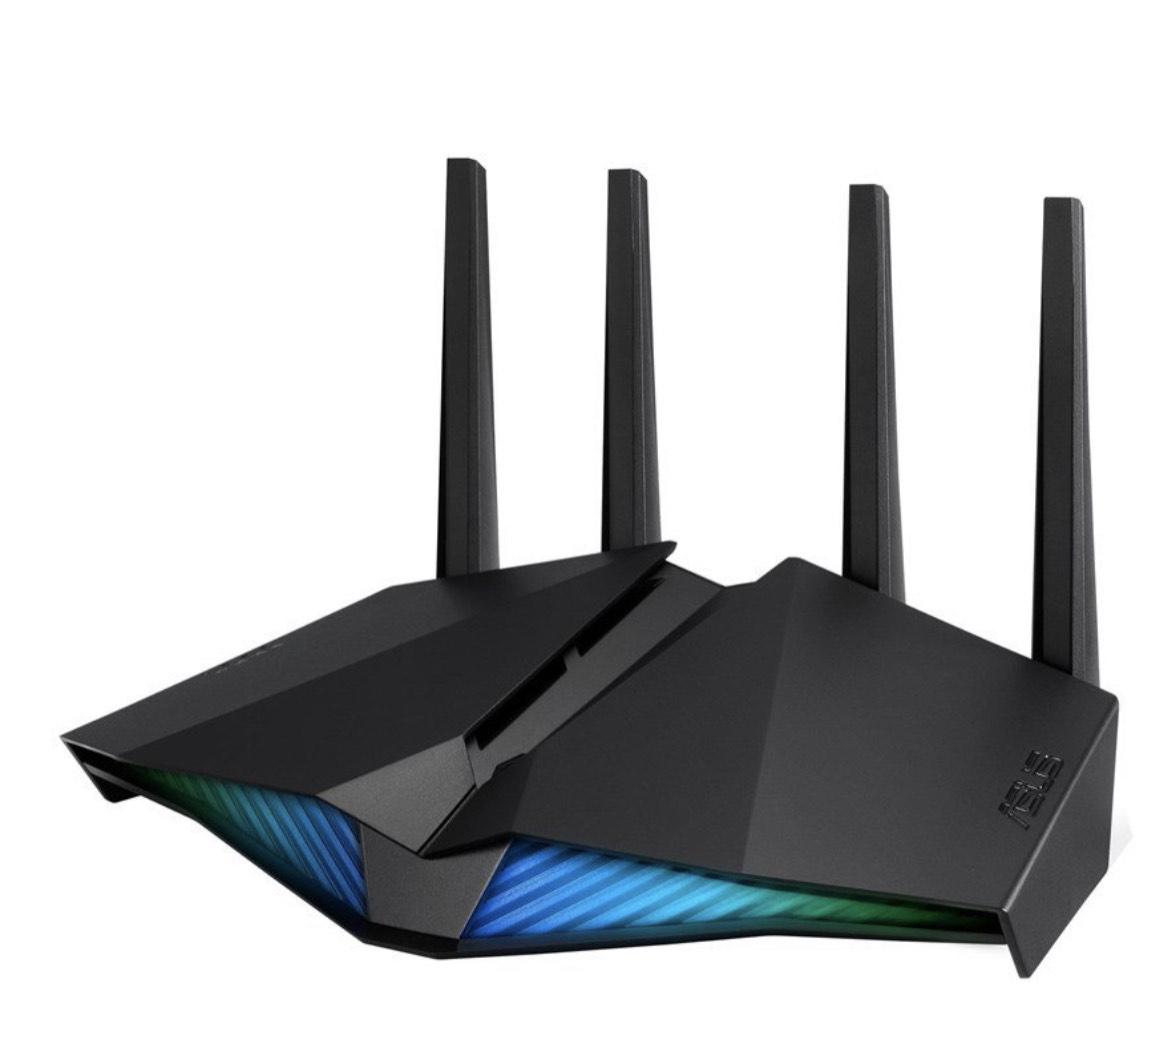 ASUS DSL-AX82U - Wireless Router Wi-Fi 6